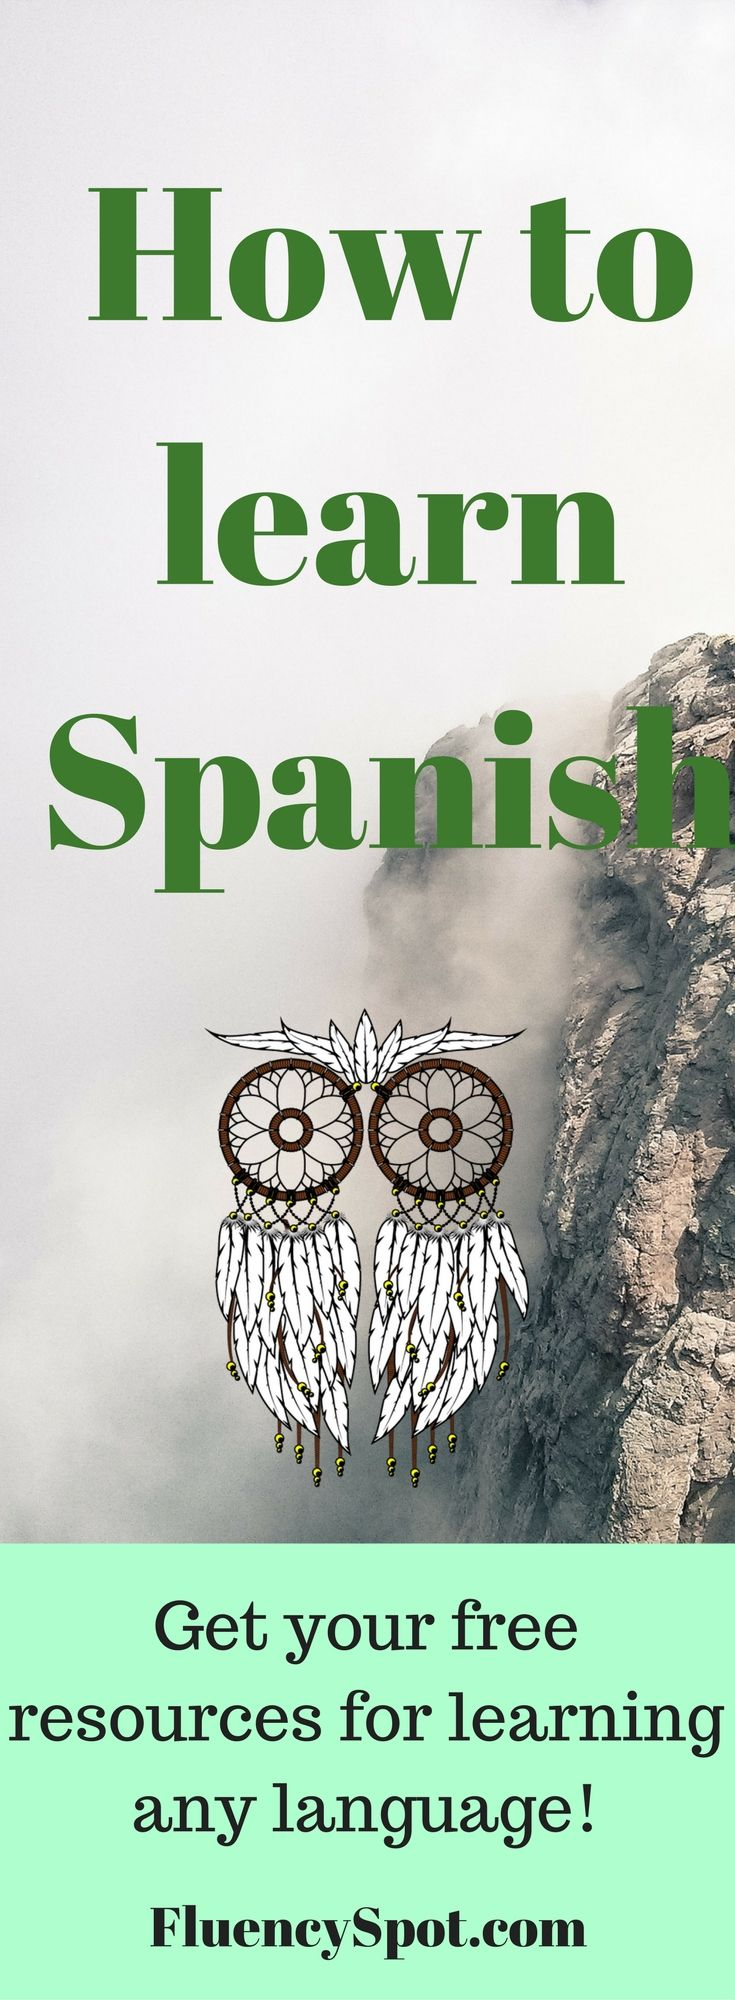 Study Spanish Free Online - 123TeachMe.com